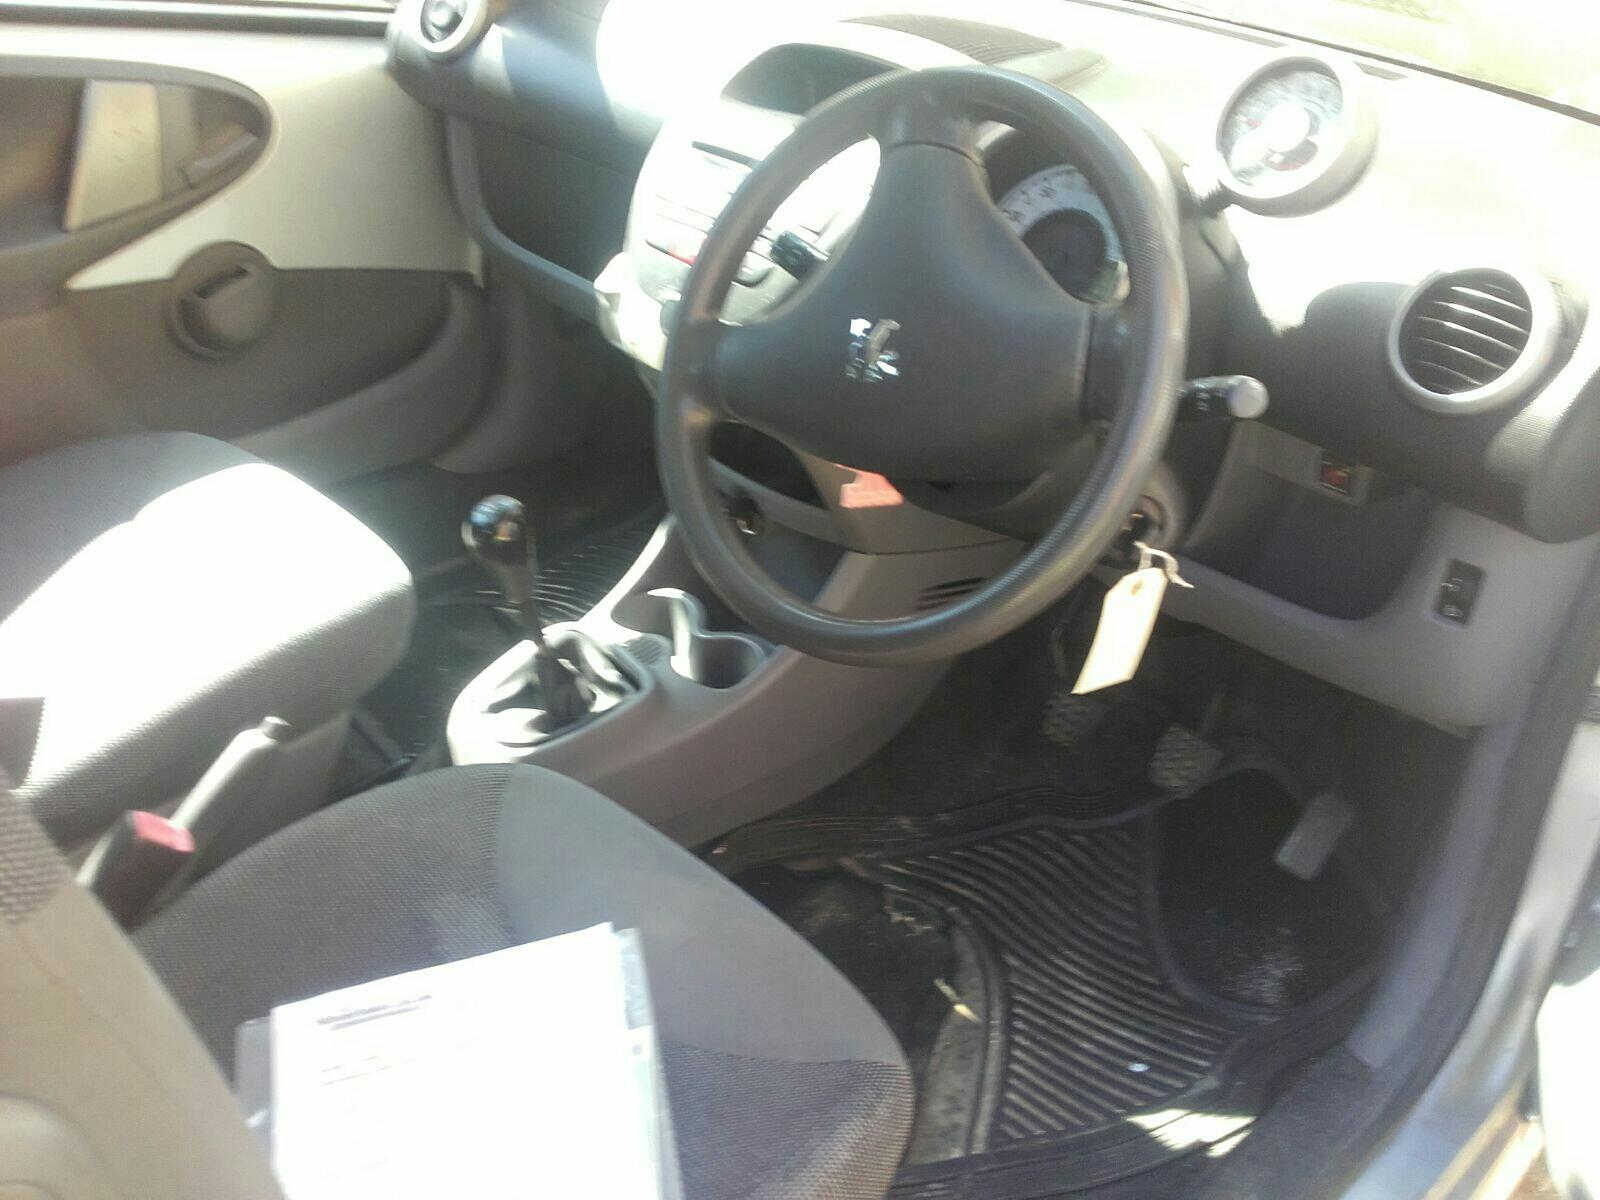 Peugeot 107 2005 To 2008 Urban 3 Door Hatchback / scrap / salvage car for  sale / auction | Silverlake Autoparts